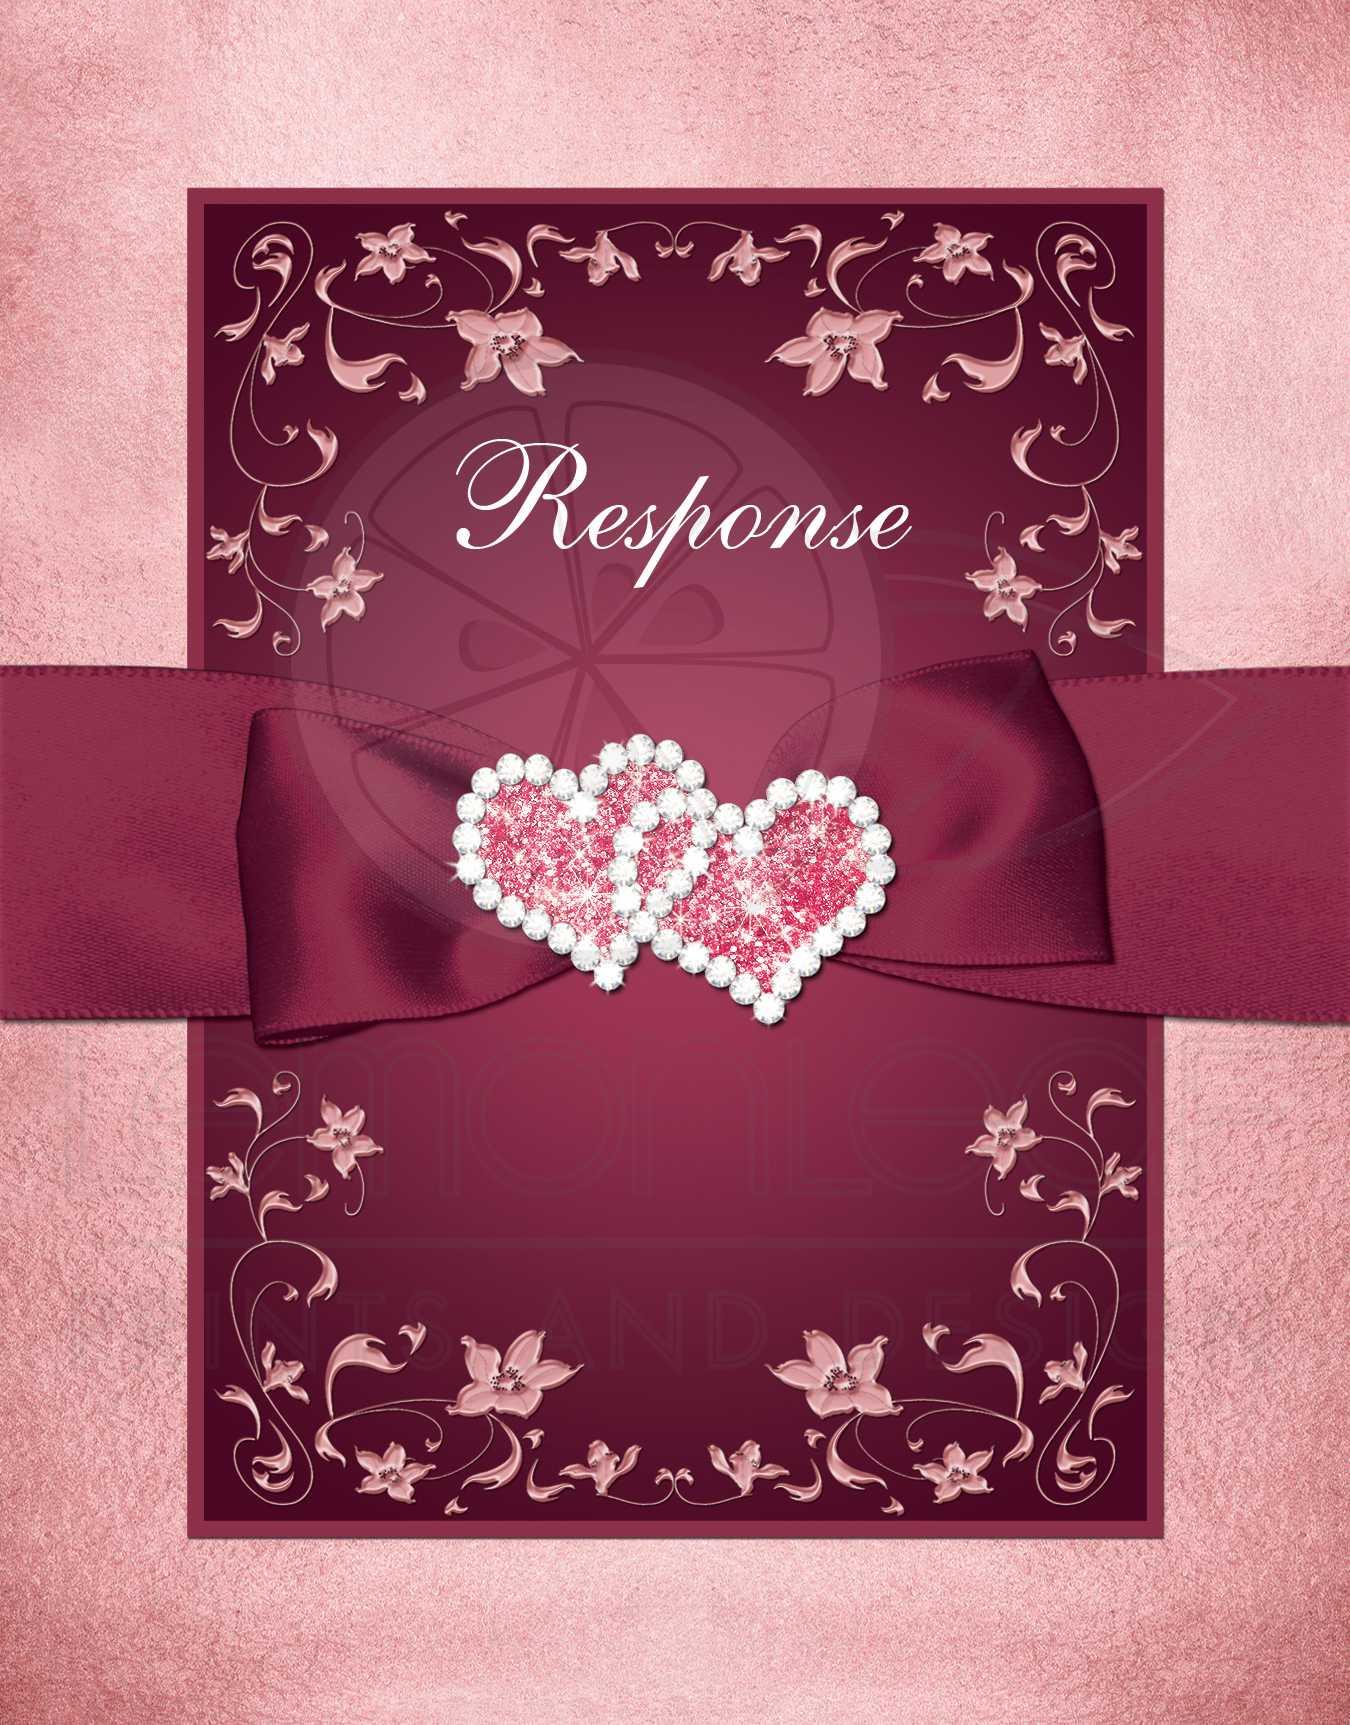 Burgundy, Blush Wedding Response Card | Flowers, Scrolls - Printed ...